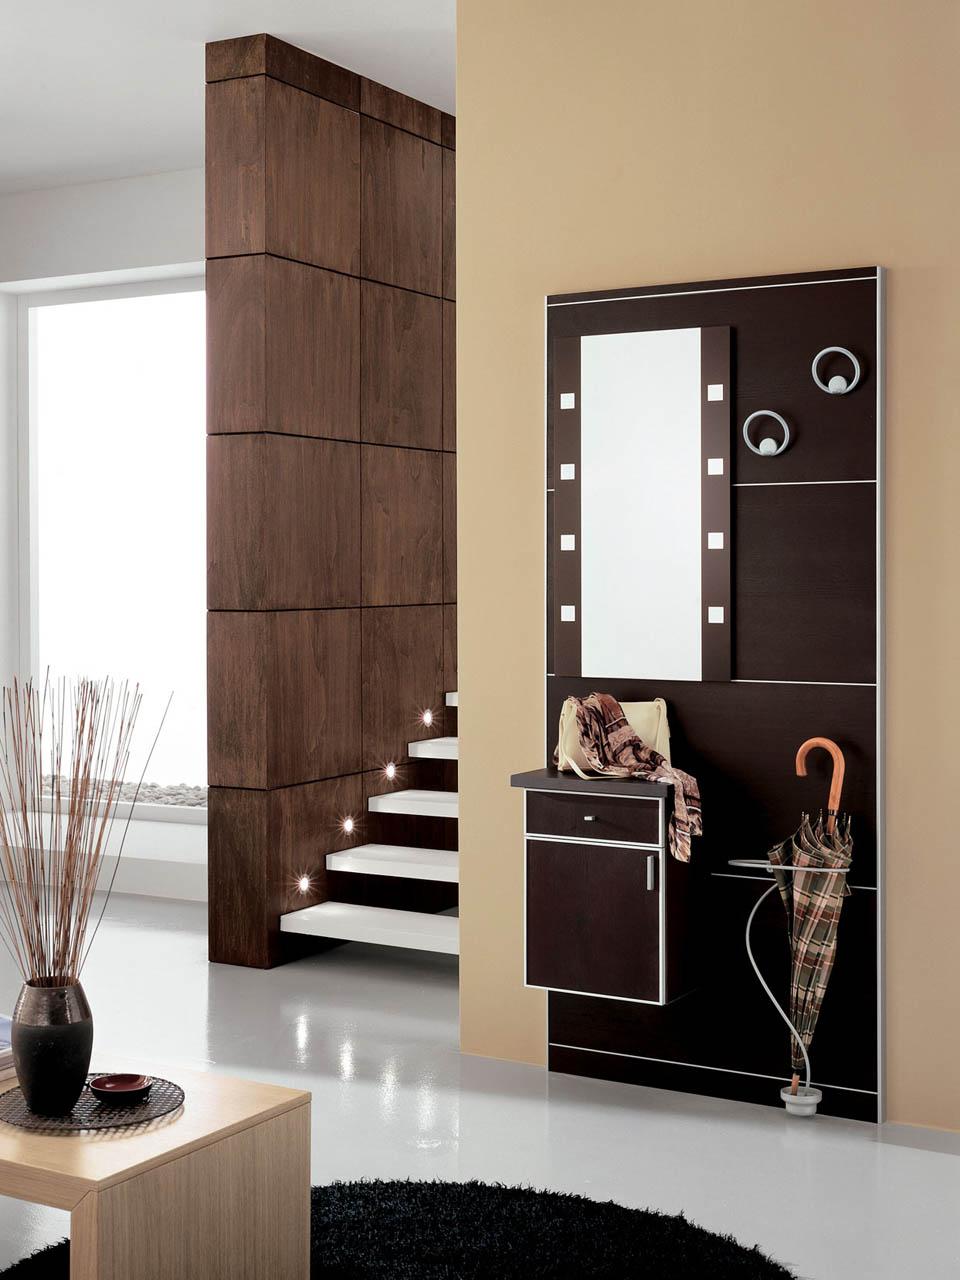 Ingresso dinamika 353 tutto mobili arredamento camere - Mobili ingresso roma ...